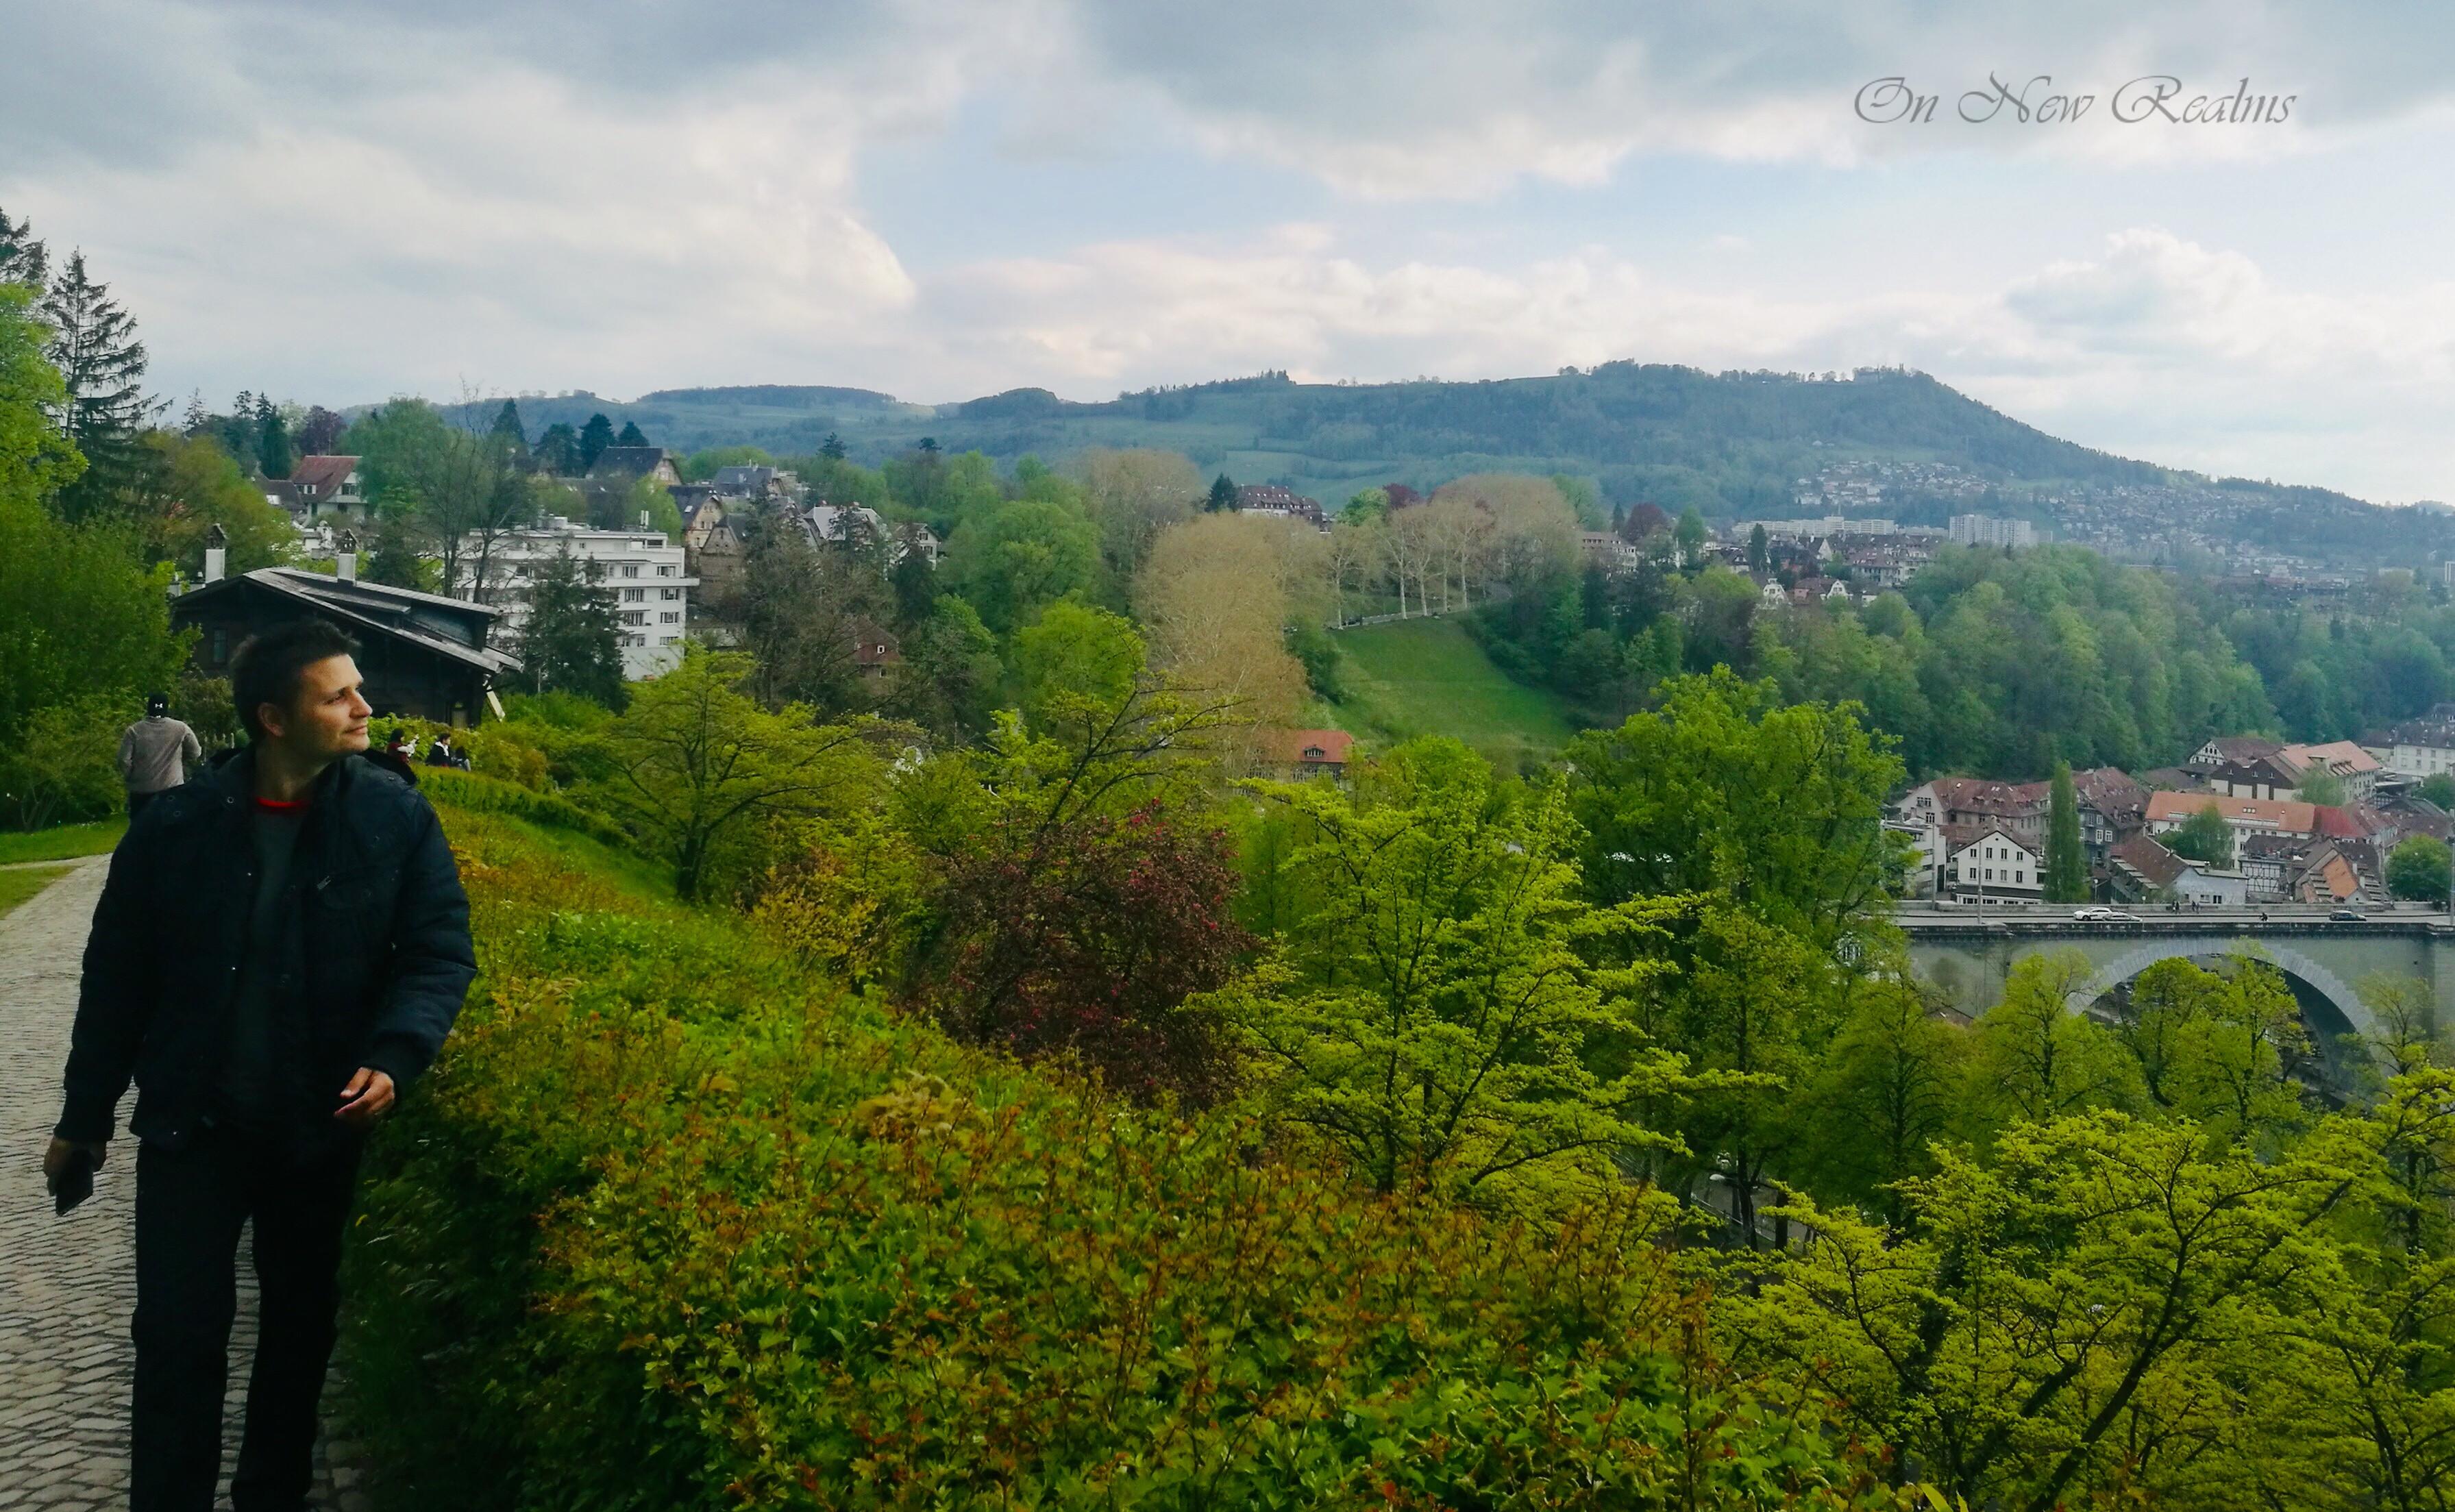 Rosengarten-Bern-Switzerland-2